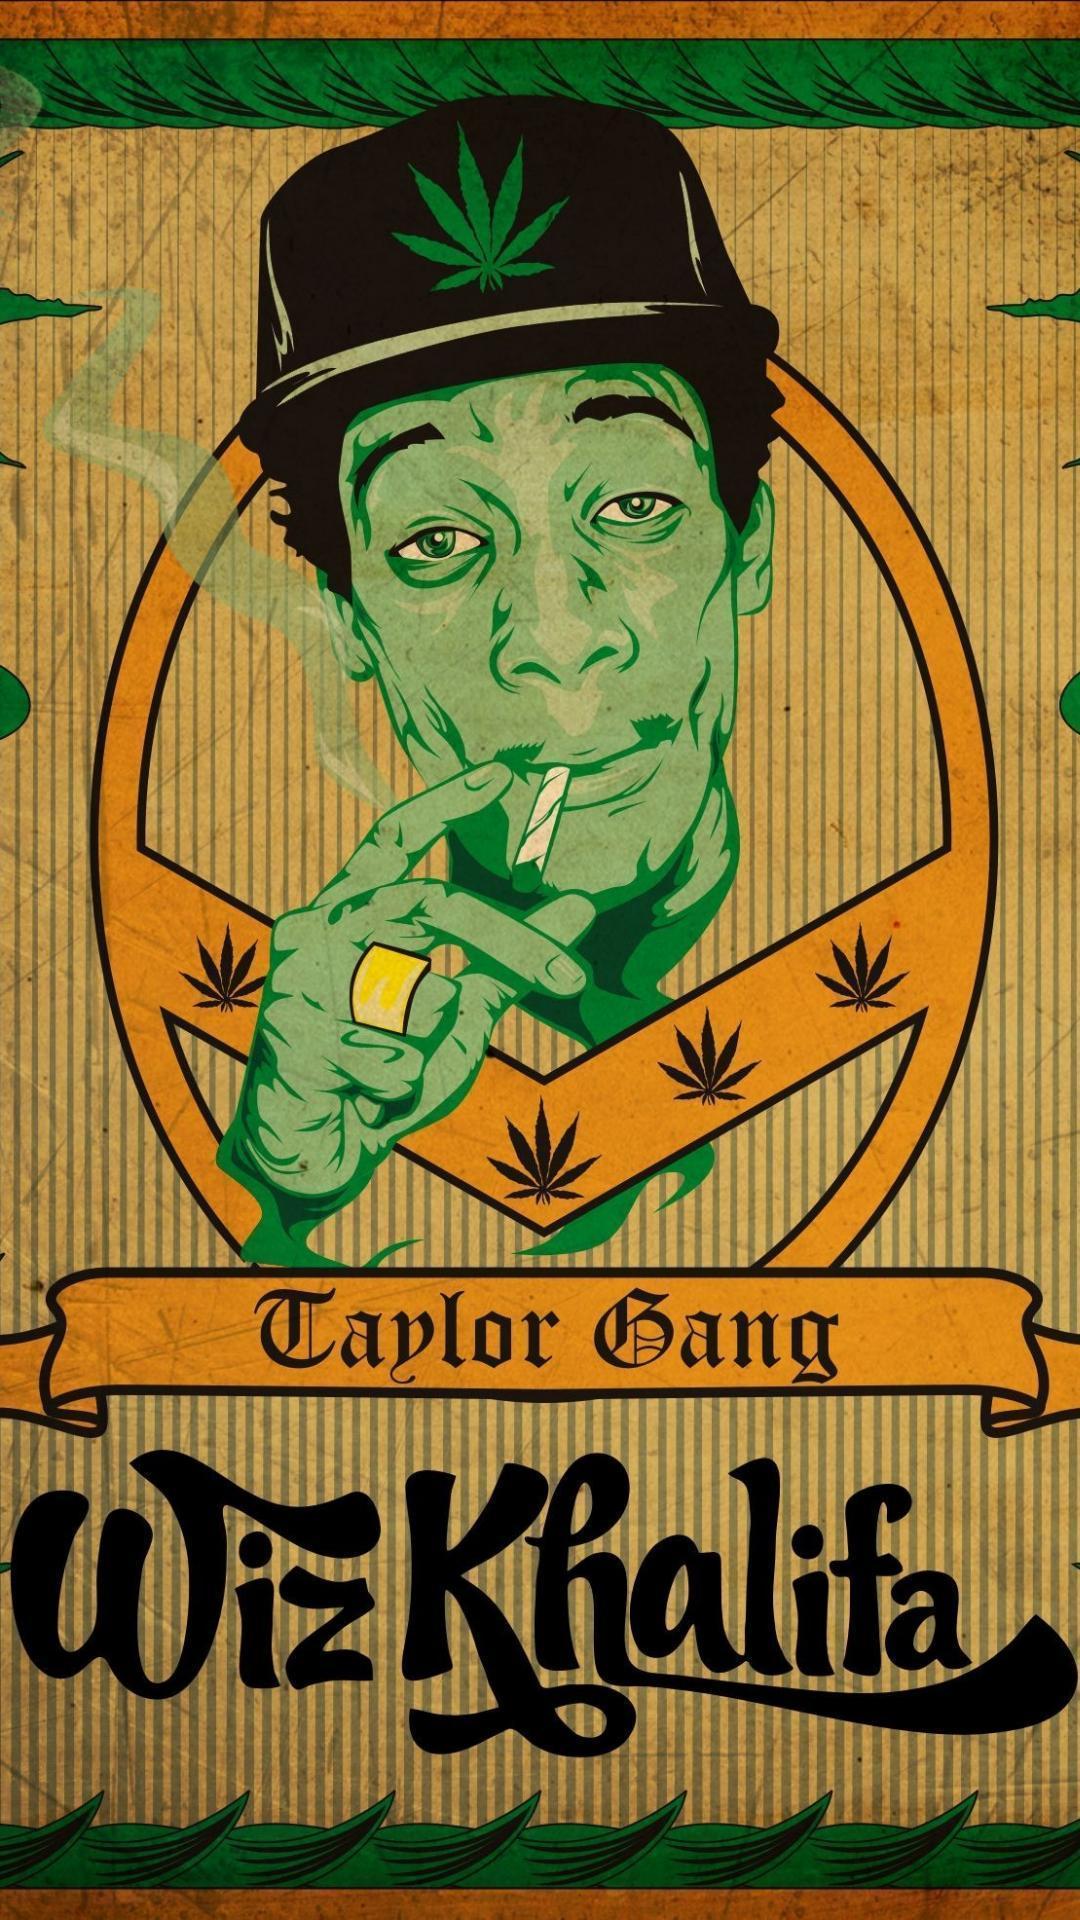 Wiz khalifa taylor gang cameron jibril thomaz wallpaper | (36200)